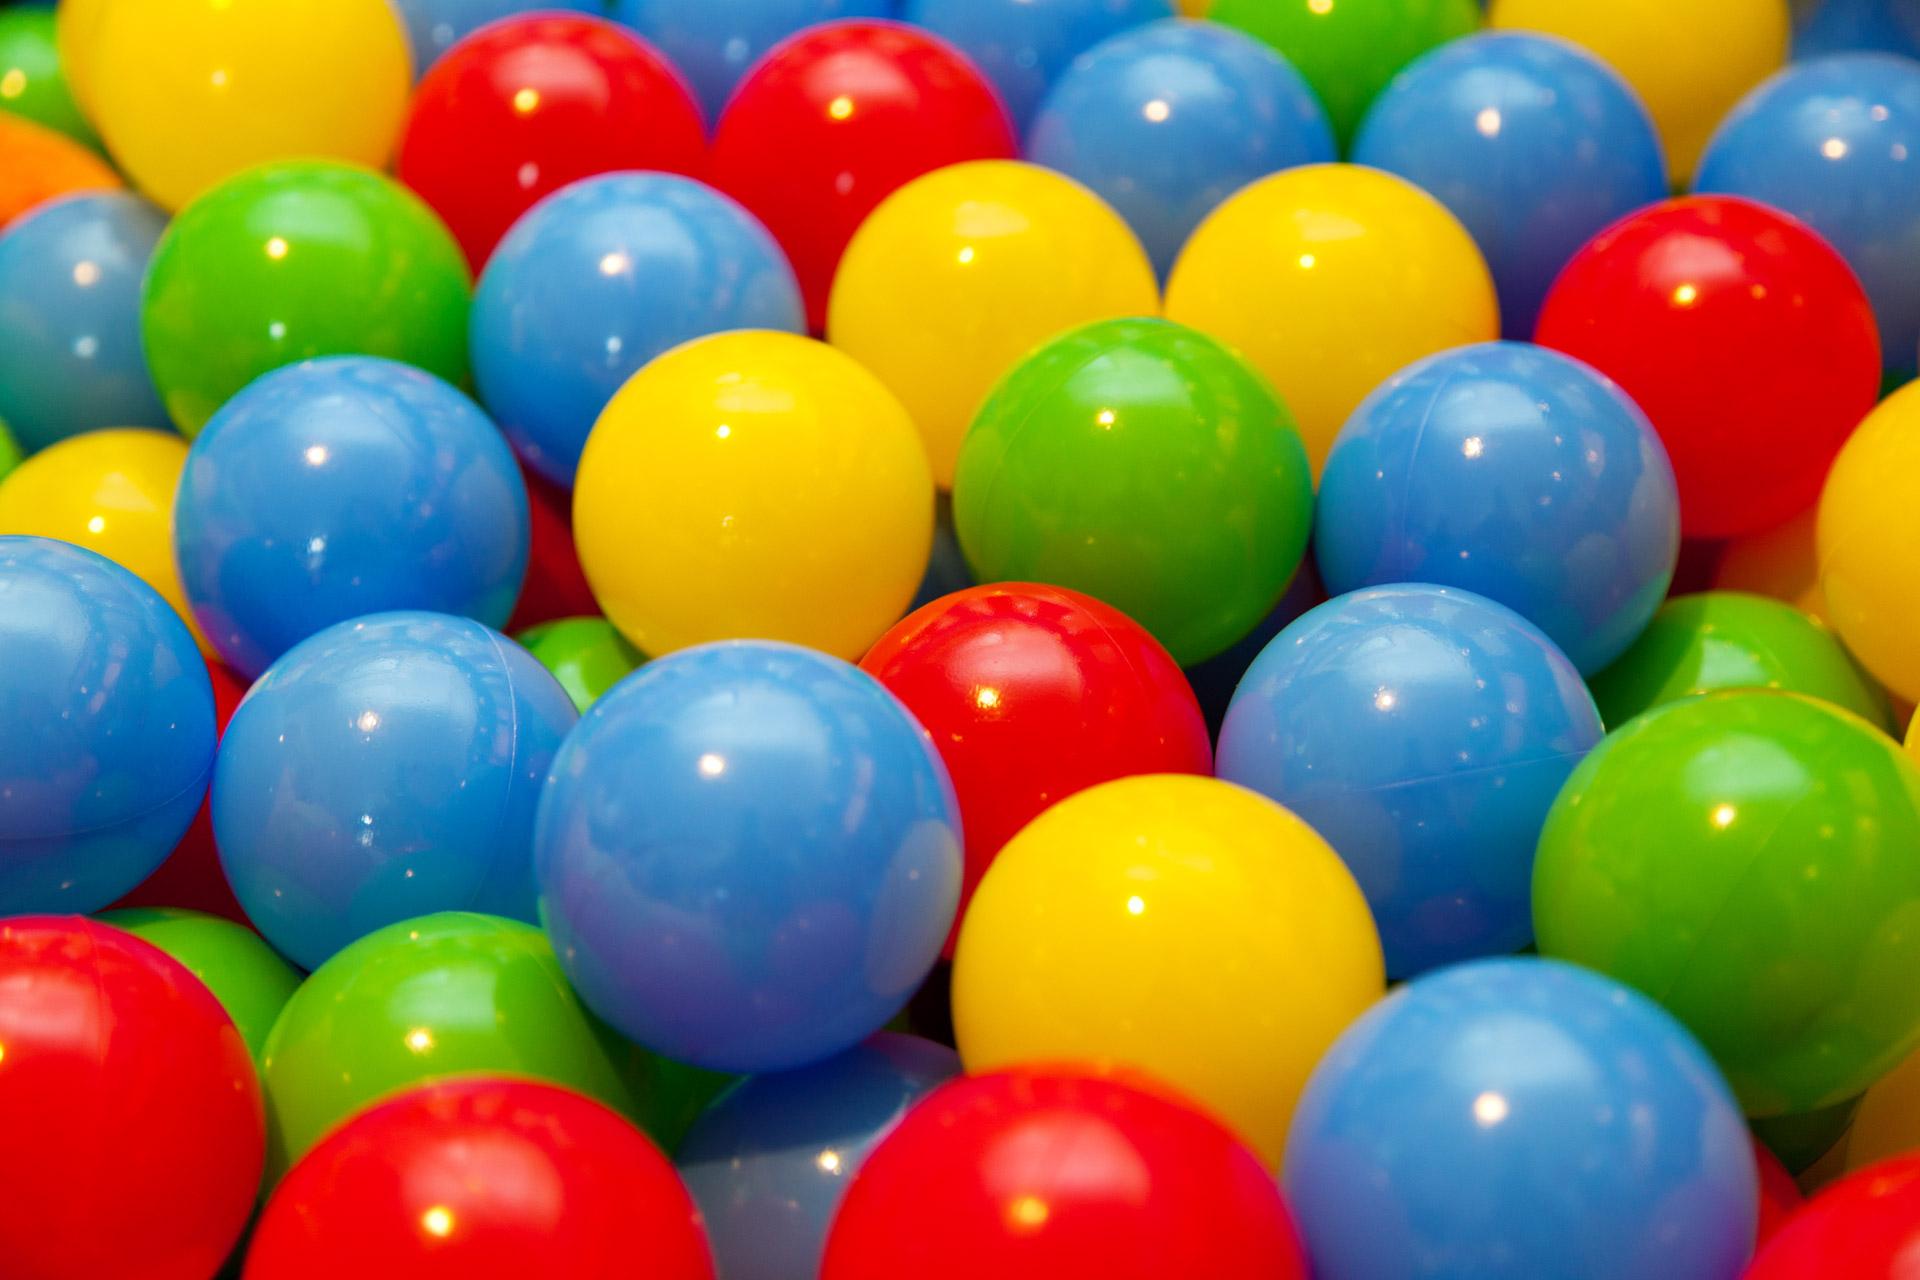 Balls Pics, CGI Collection